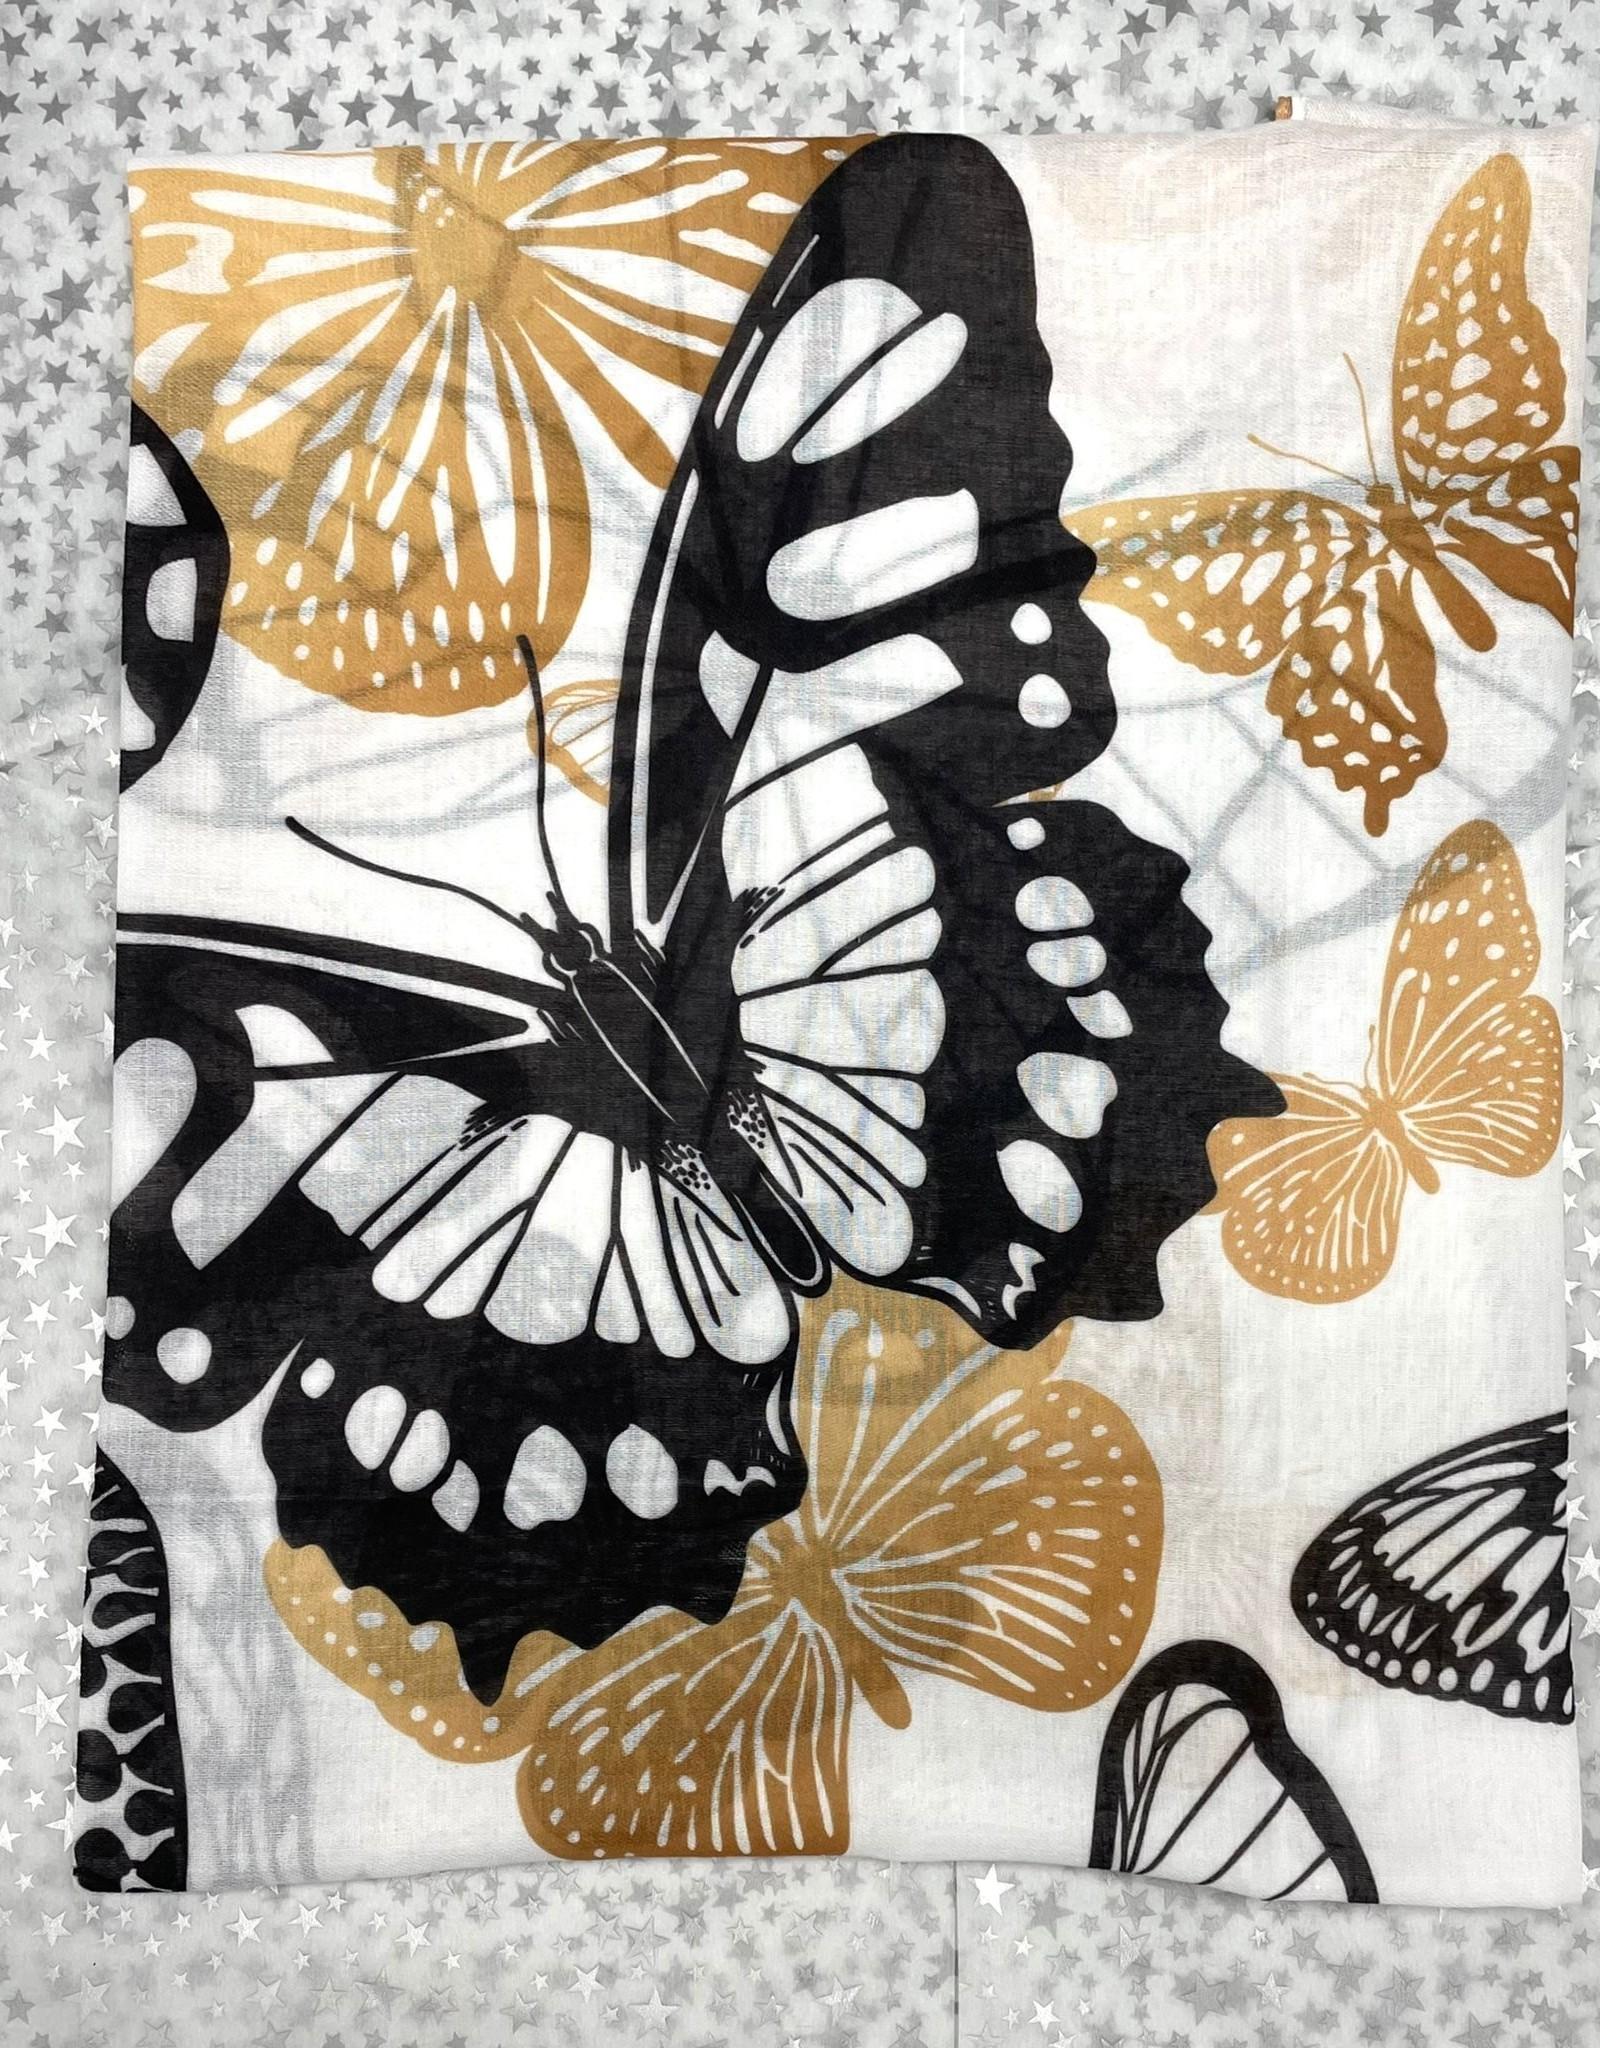 PinkDot PinkDot Big Butterfly Print Flat Mitpachat